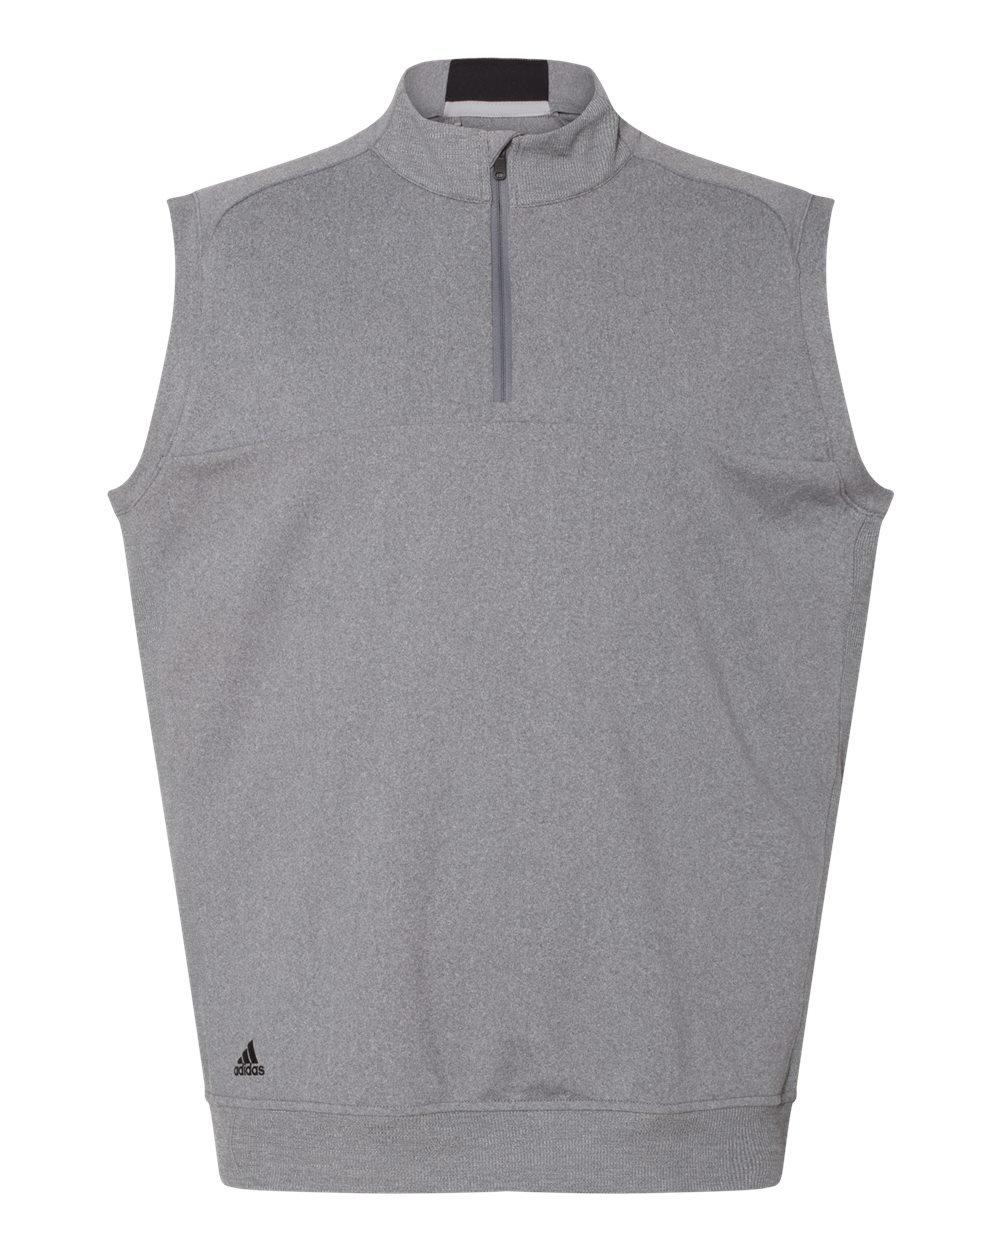 adidas Golf Mens Quarter-Zip Club Vest (A271) -Vista Grey -M